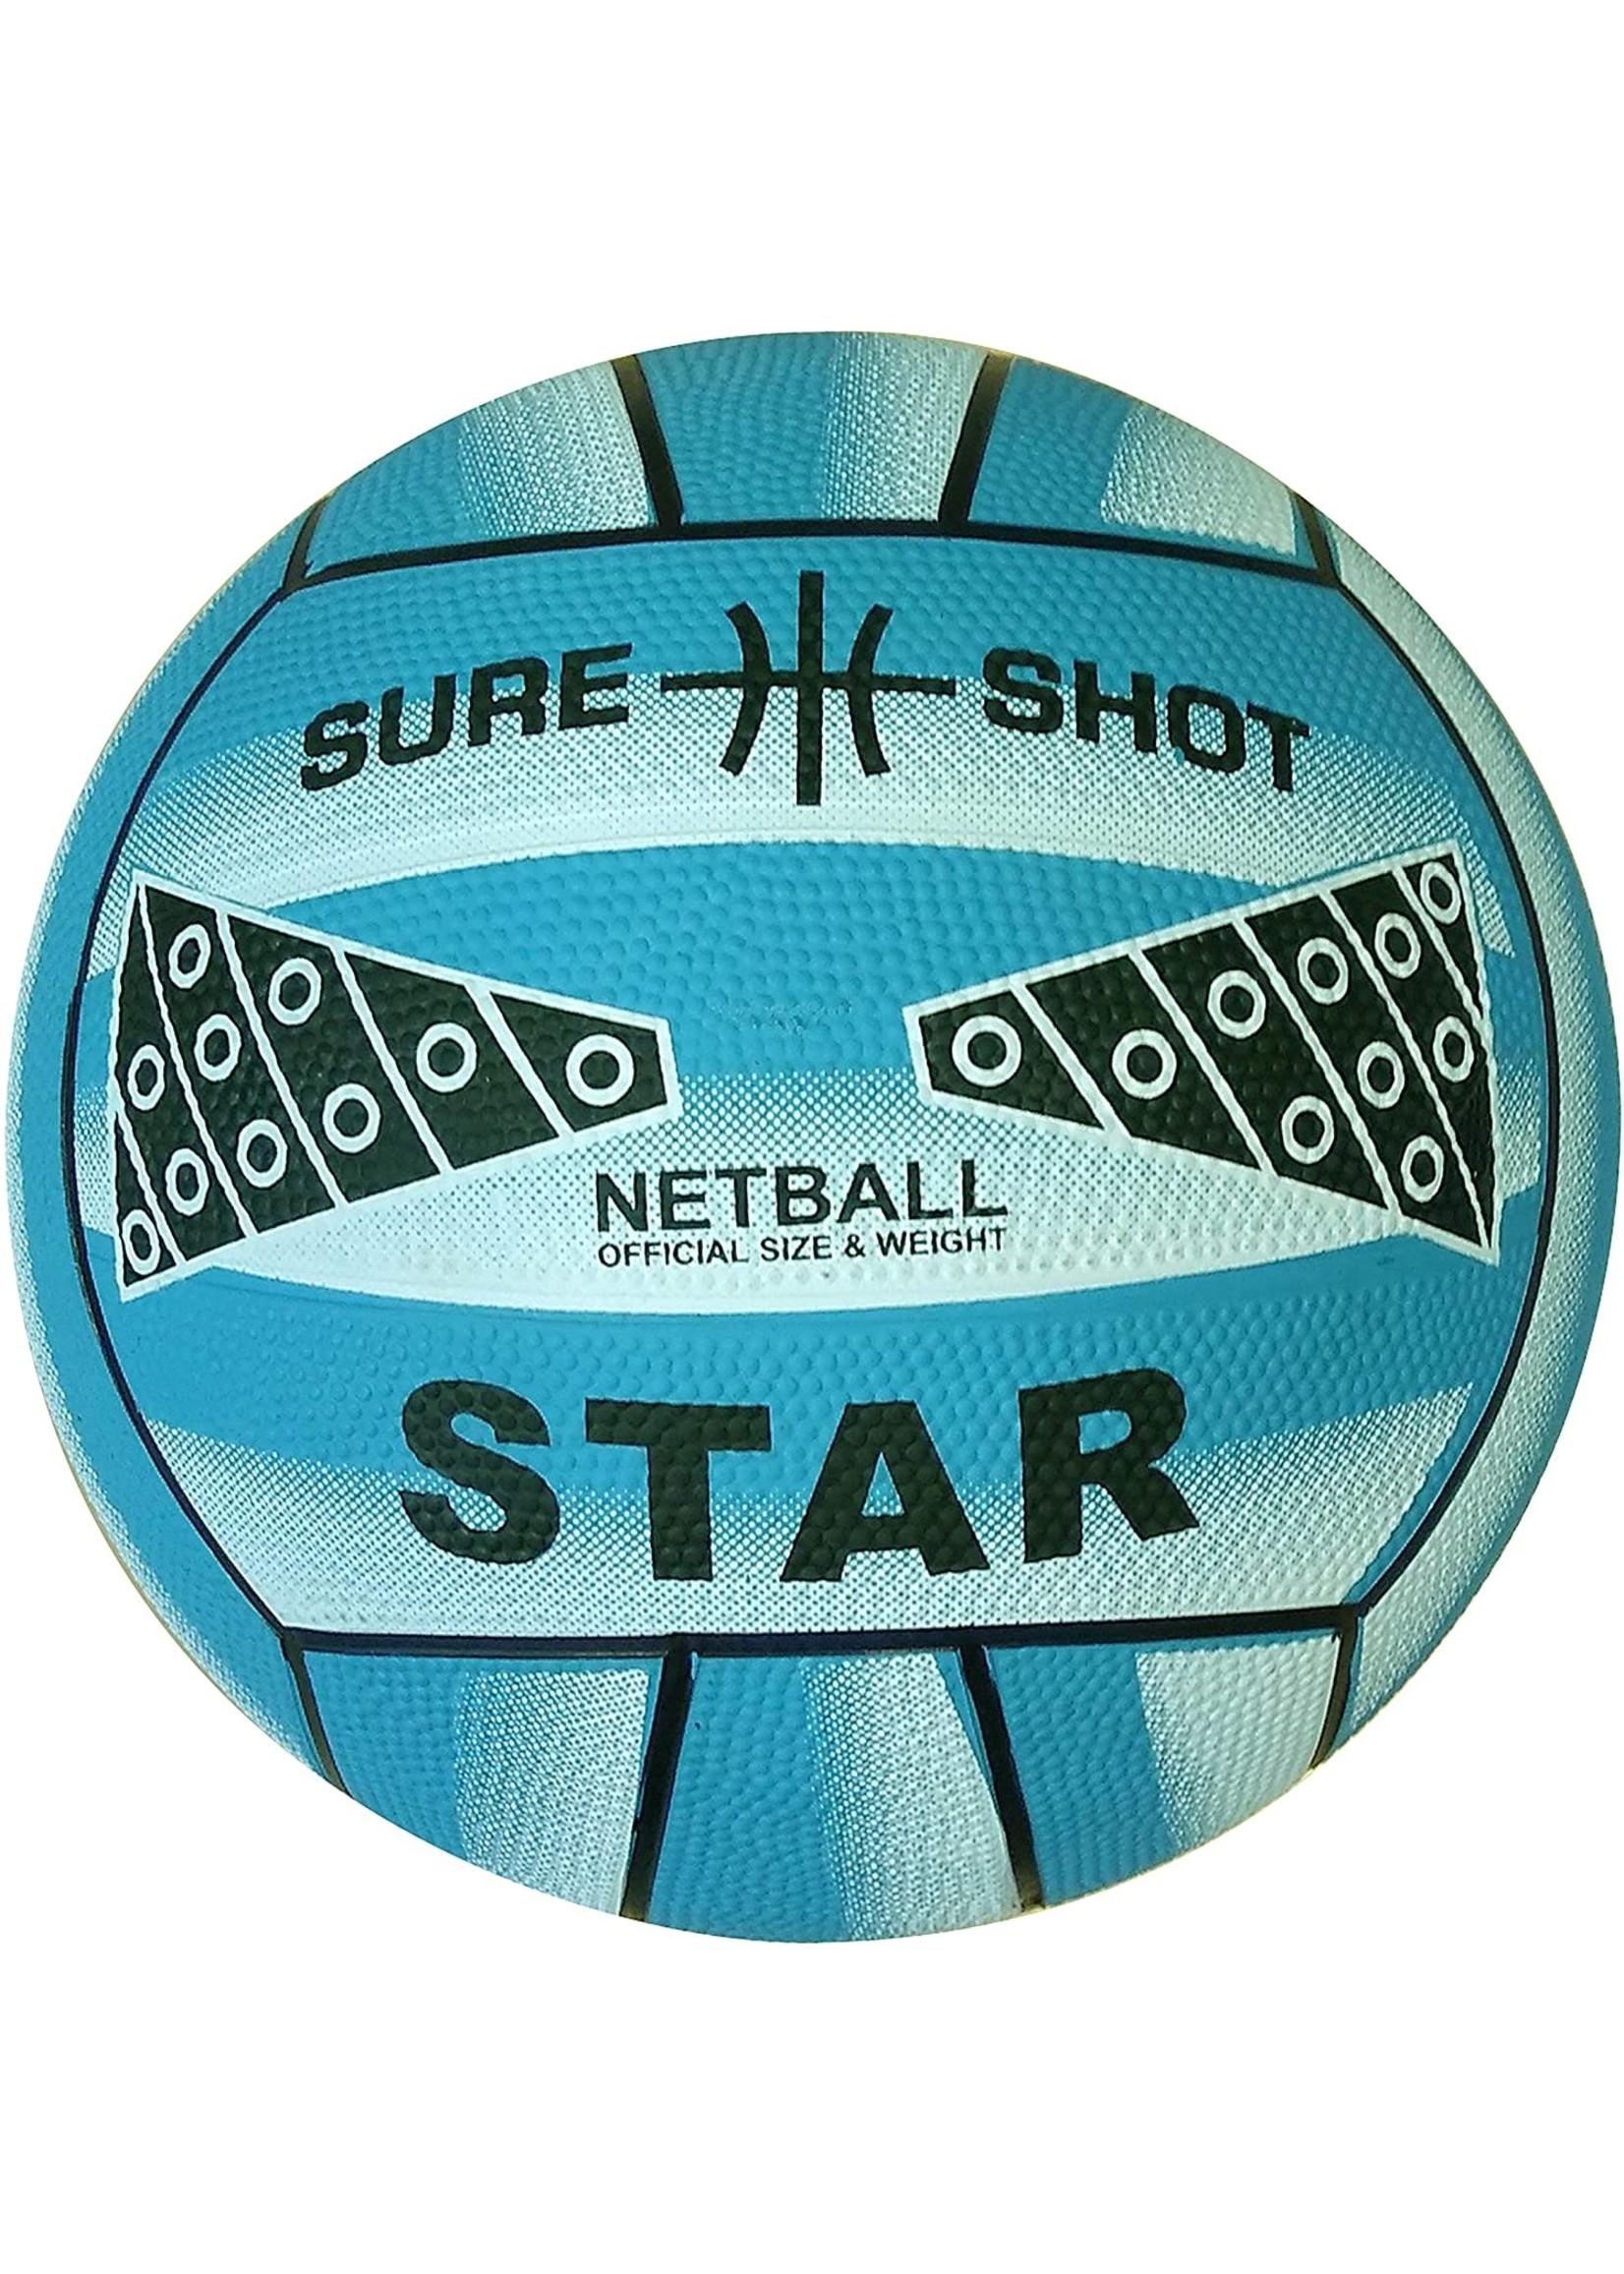 Sure Shot Star Moulded Netball, Blue (2021)